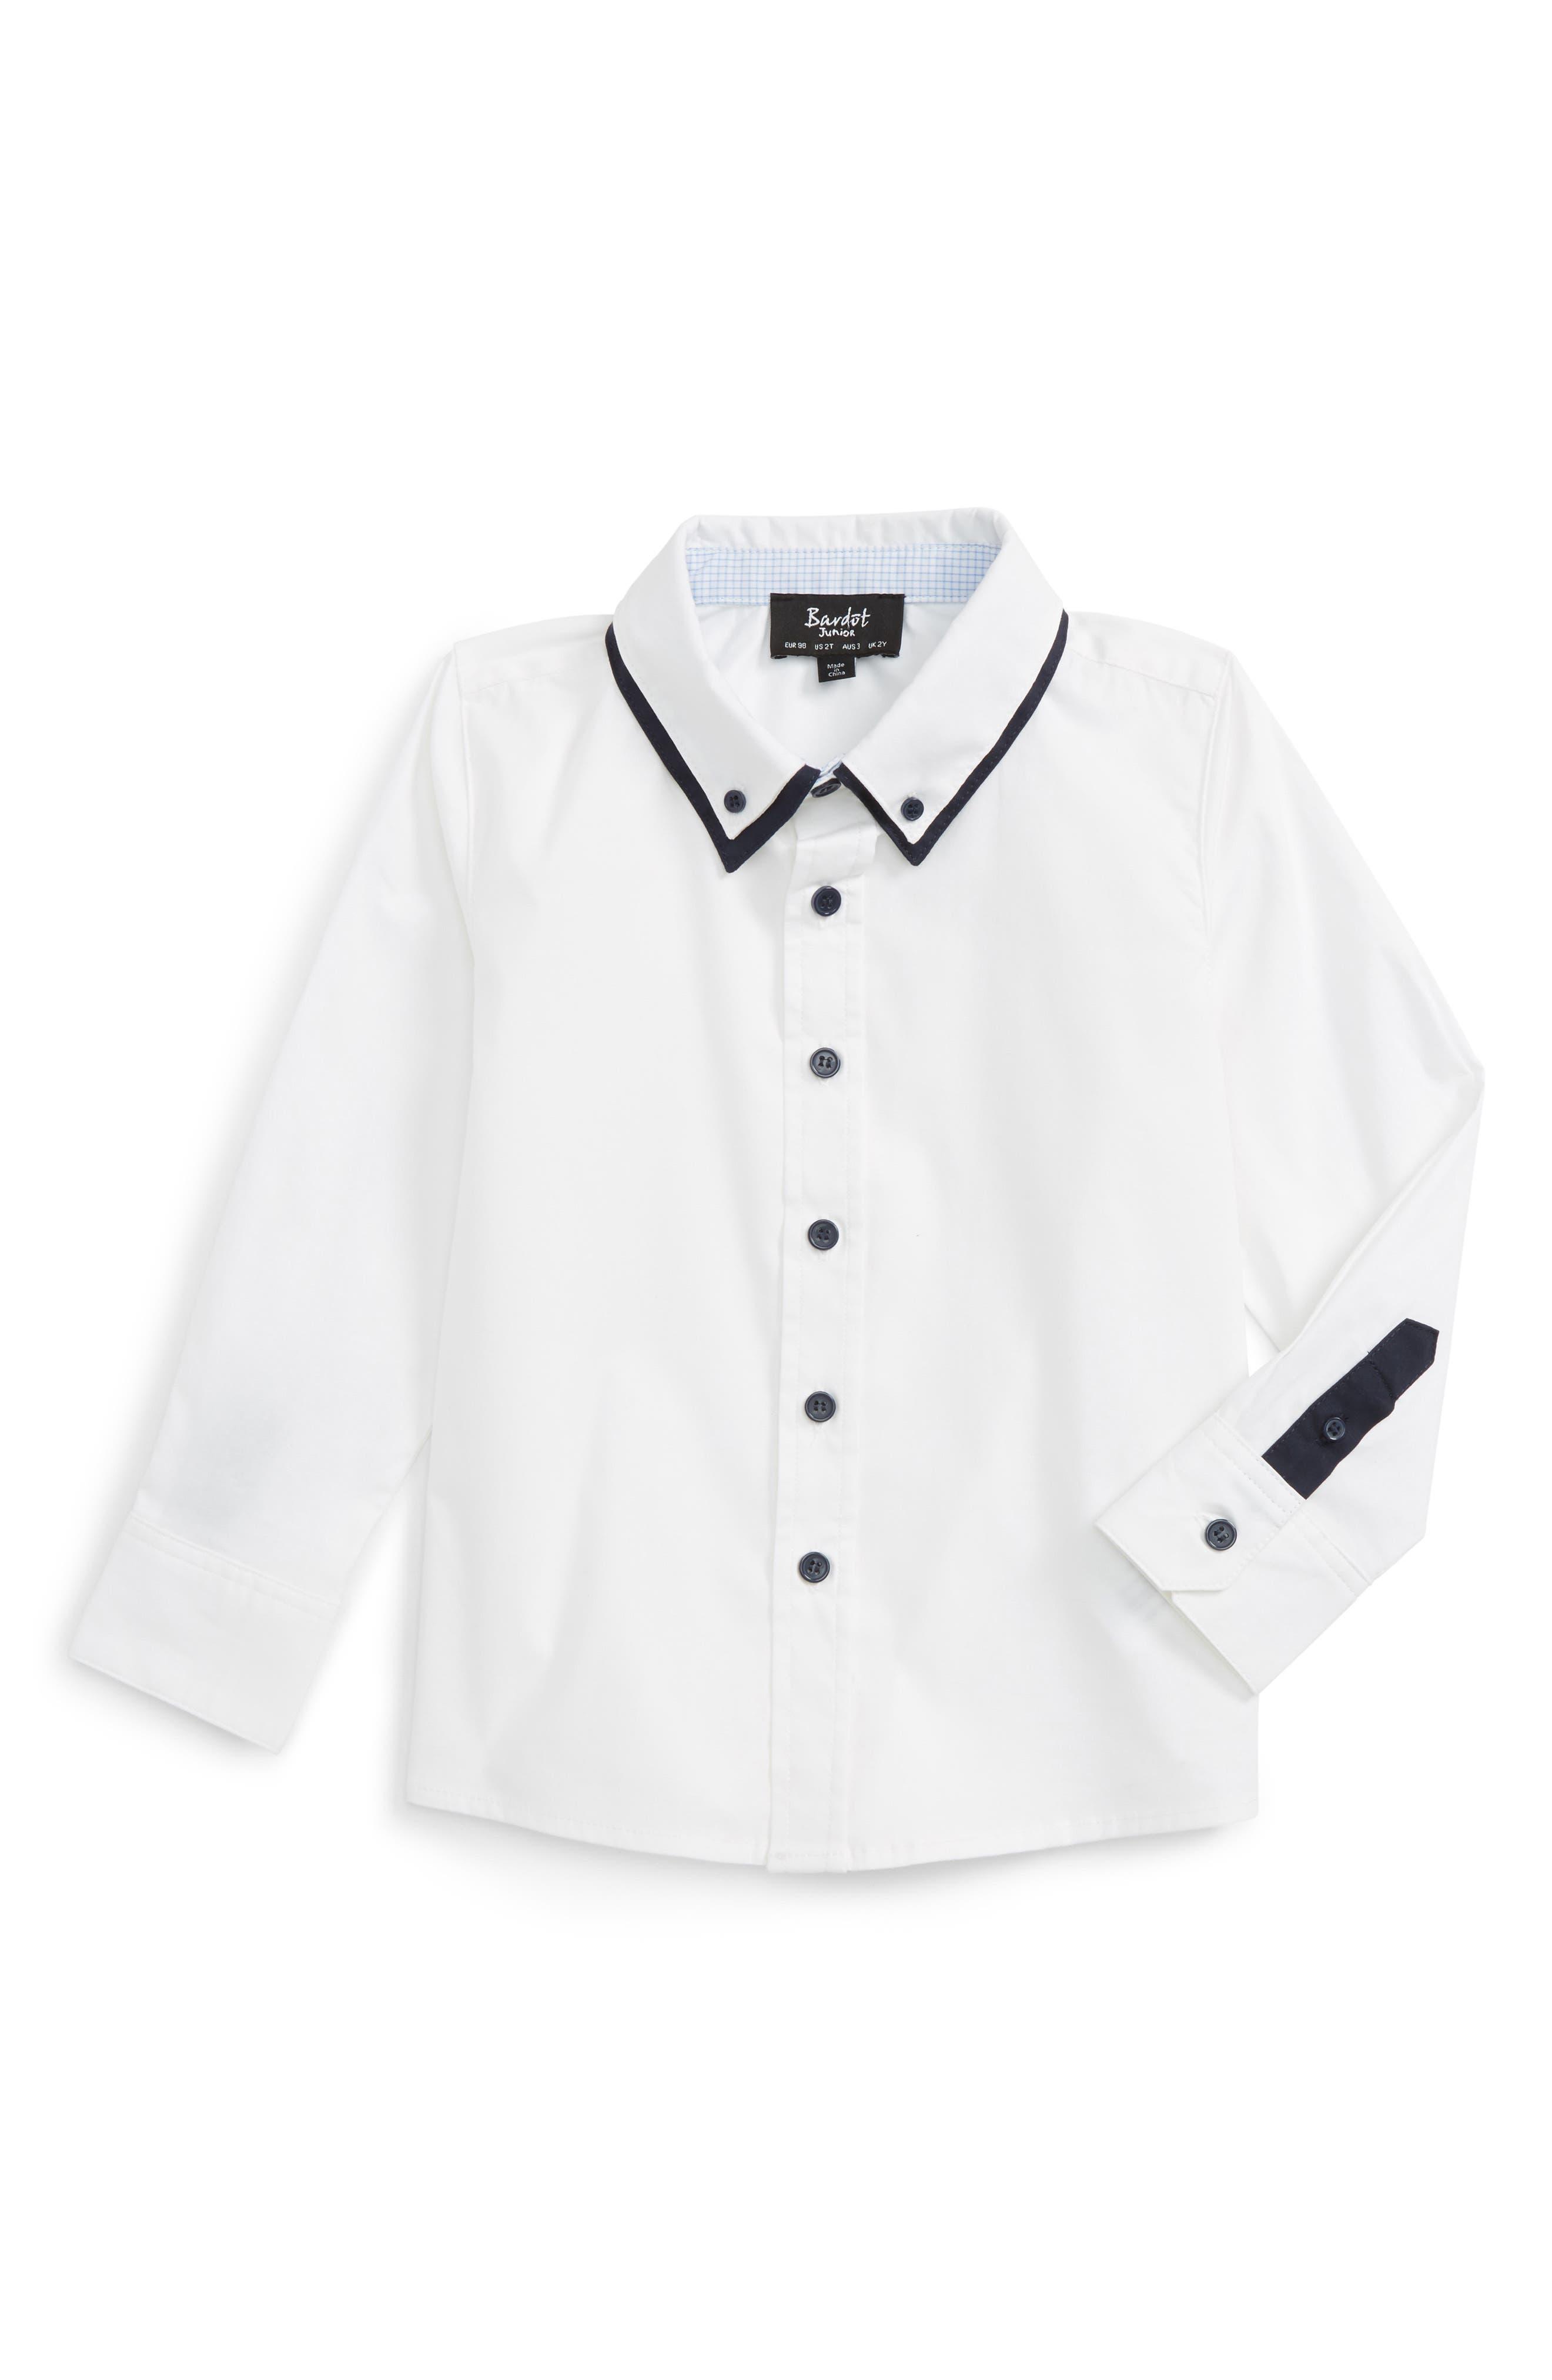 Alternate Image 1 Selected - Bardot Junior Atlantic Contrast Trim Shirt (Little Boys)